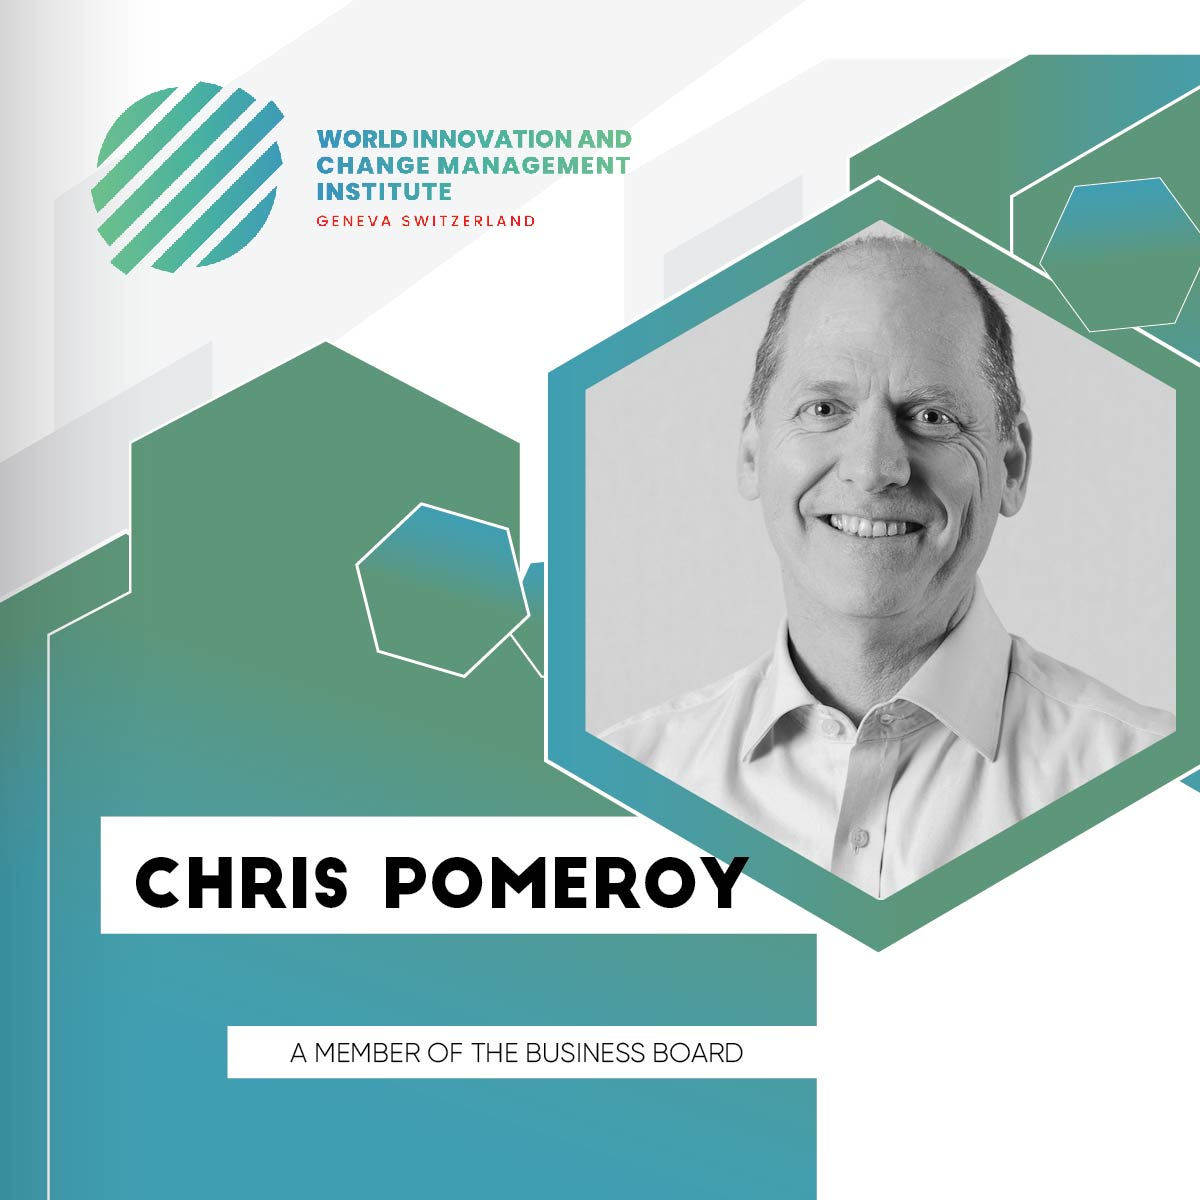 Chris Pomeroy